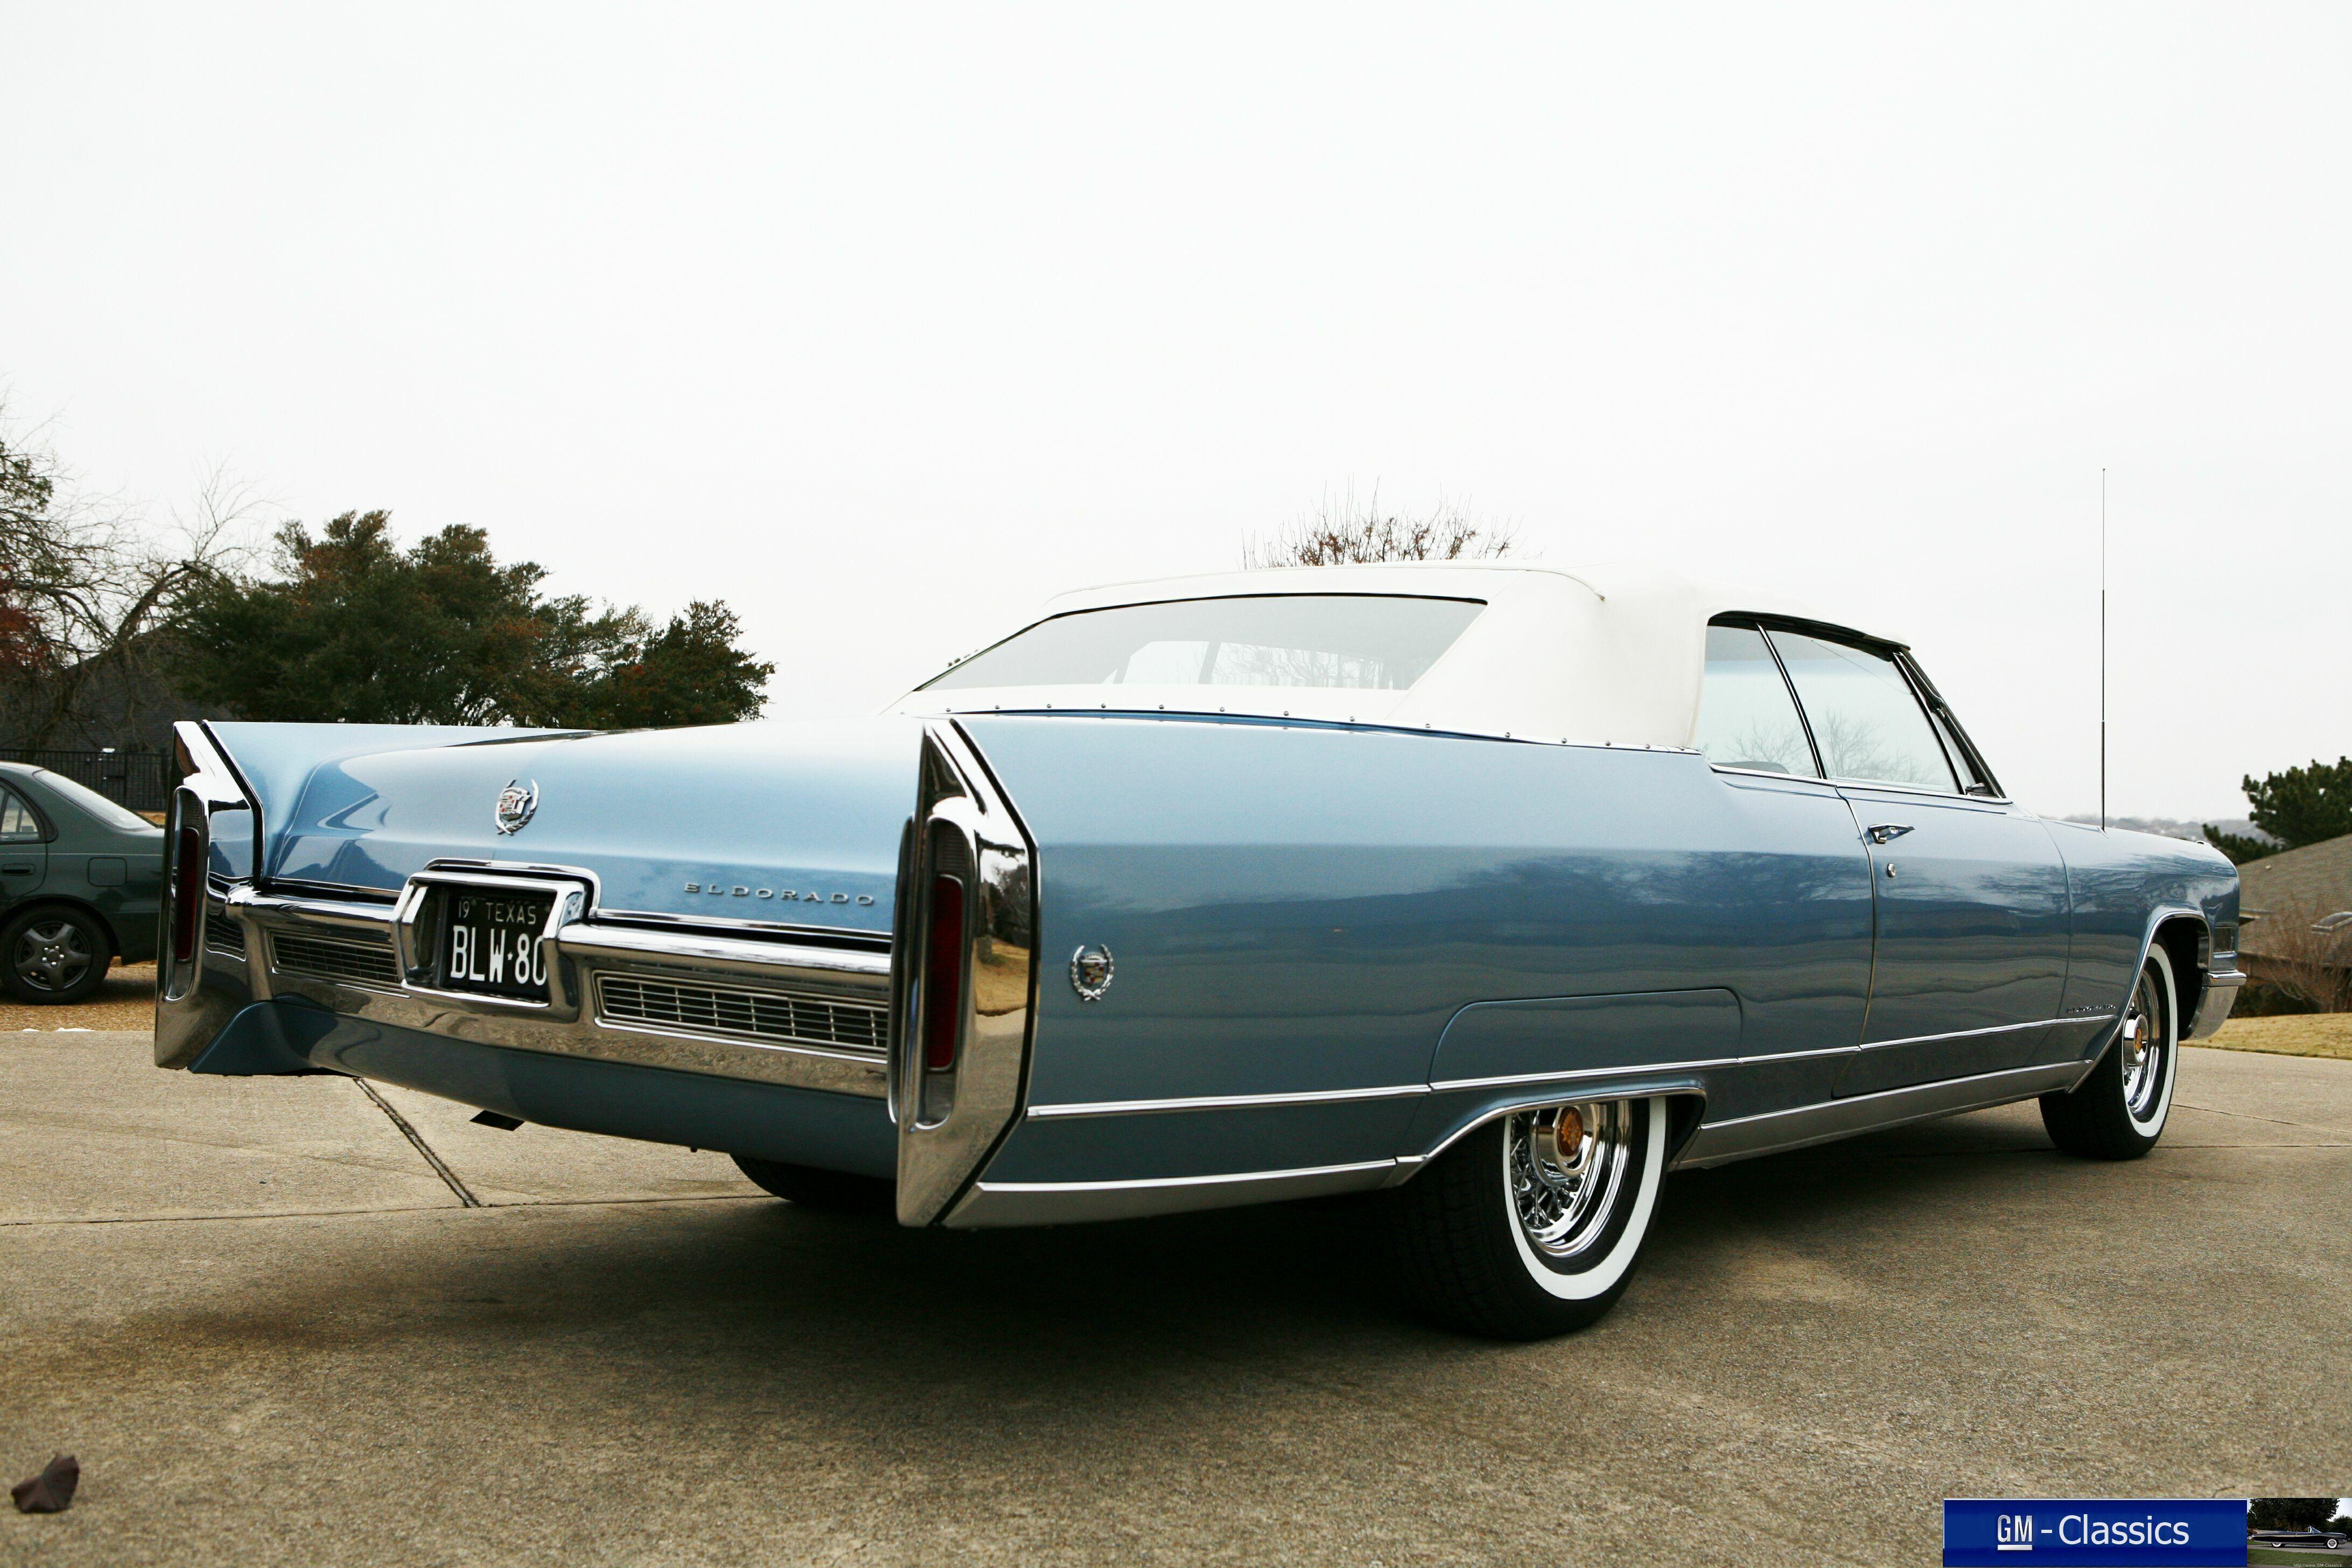 1966 Cadillac Eldorado - Matt